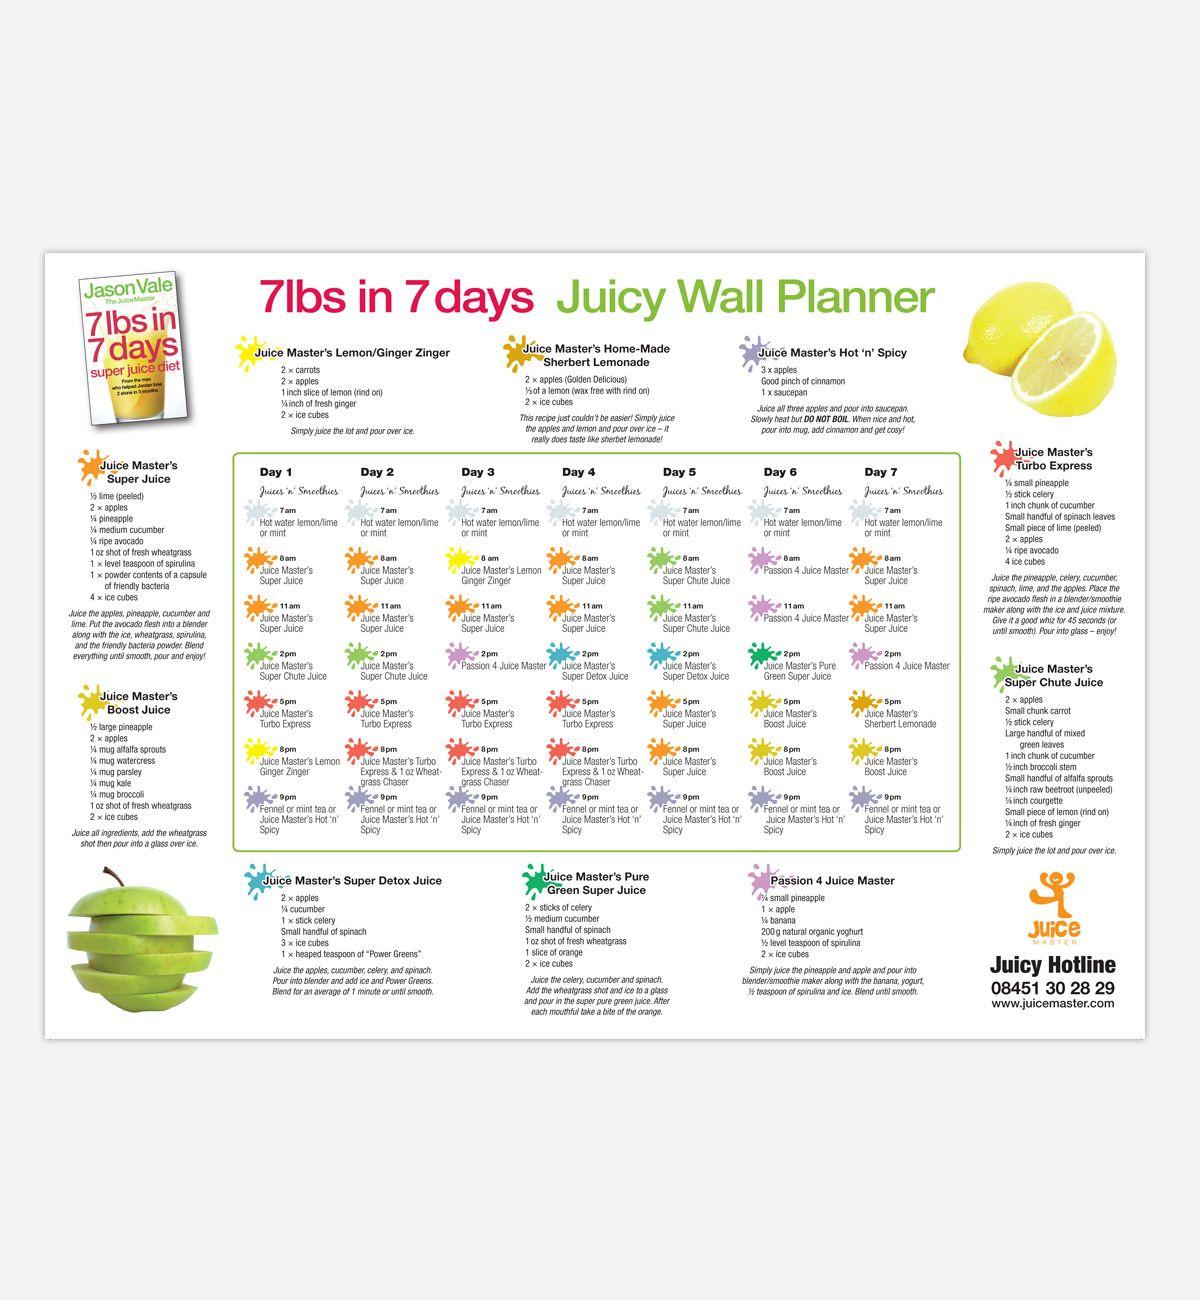 7lb In 7 Days Wallplanner Jpg 1200 1300 Juice Master Wall Planner Juice Diet Plan